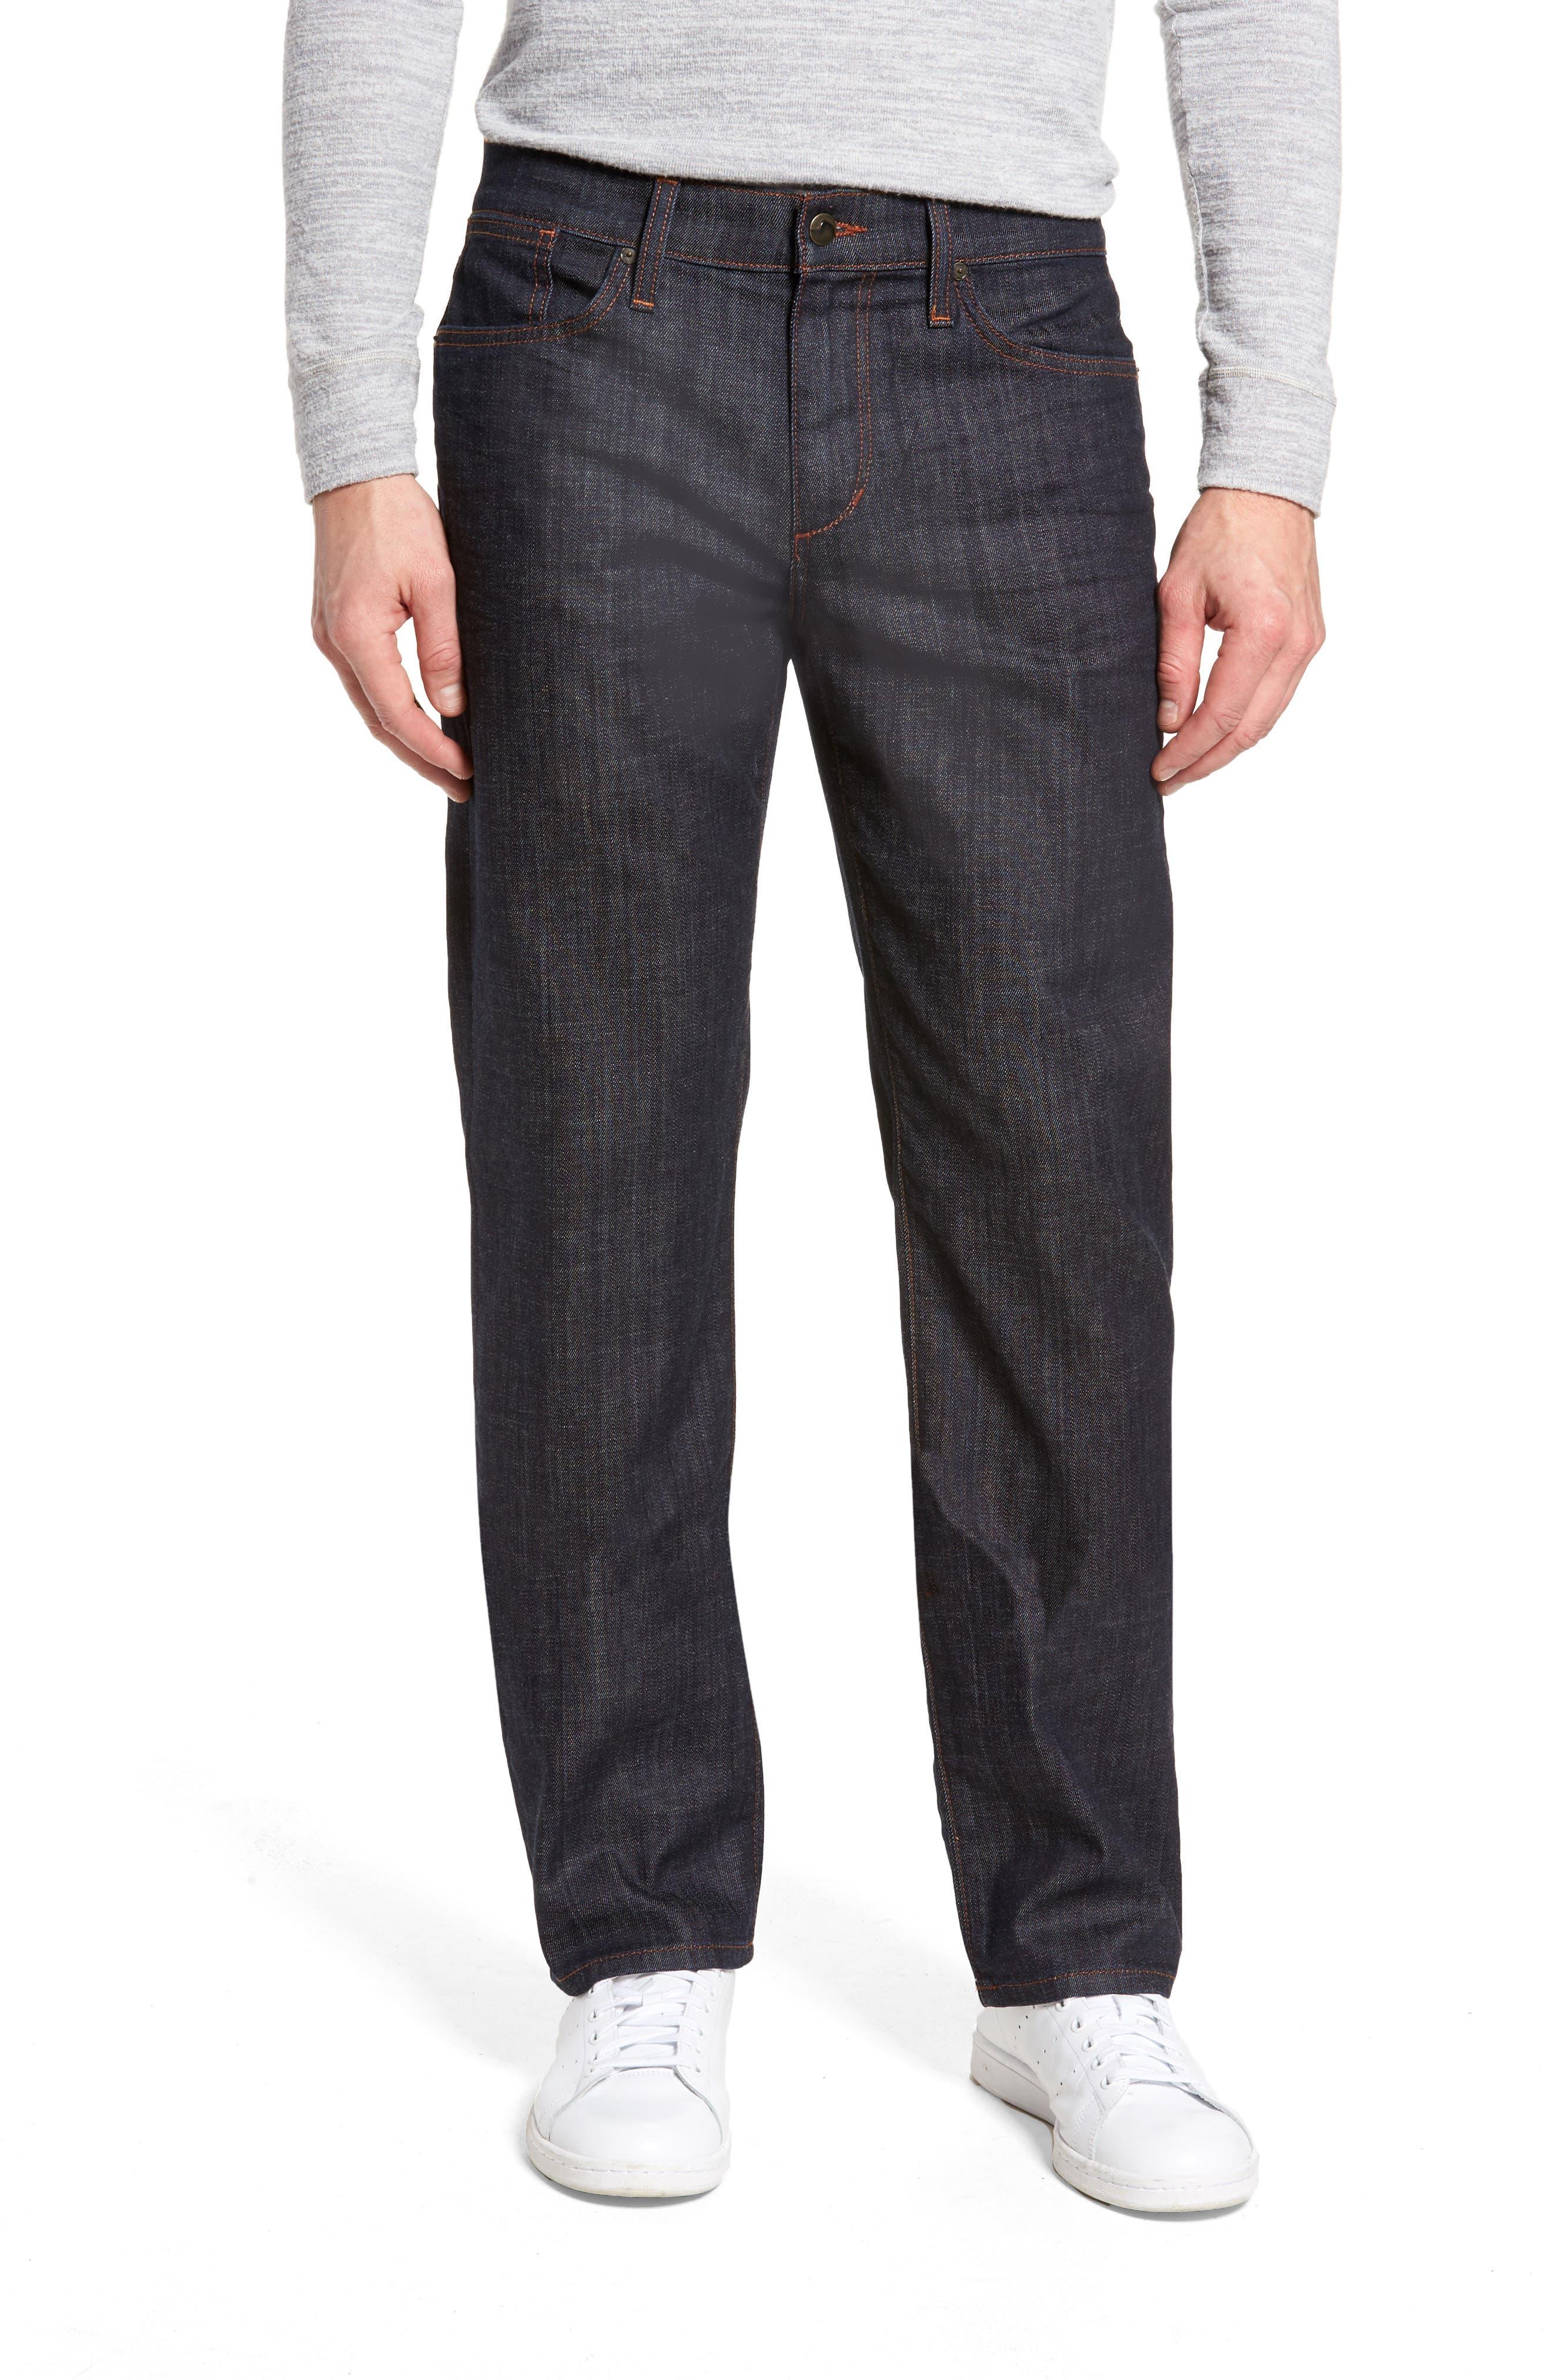 jeans mens comfortable comforter favourites heavyweight most denim five